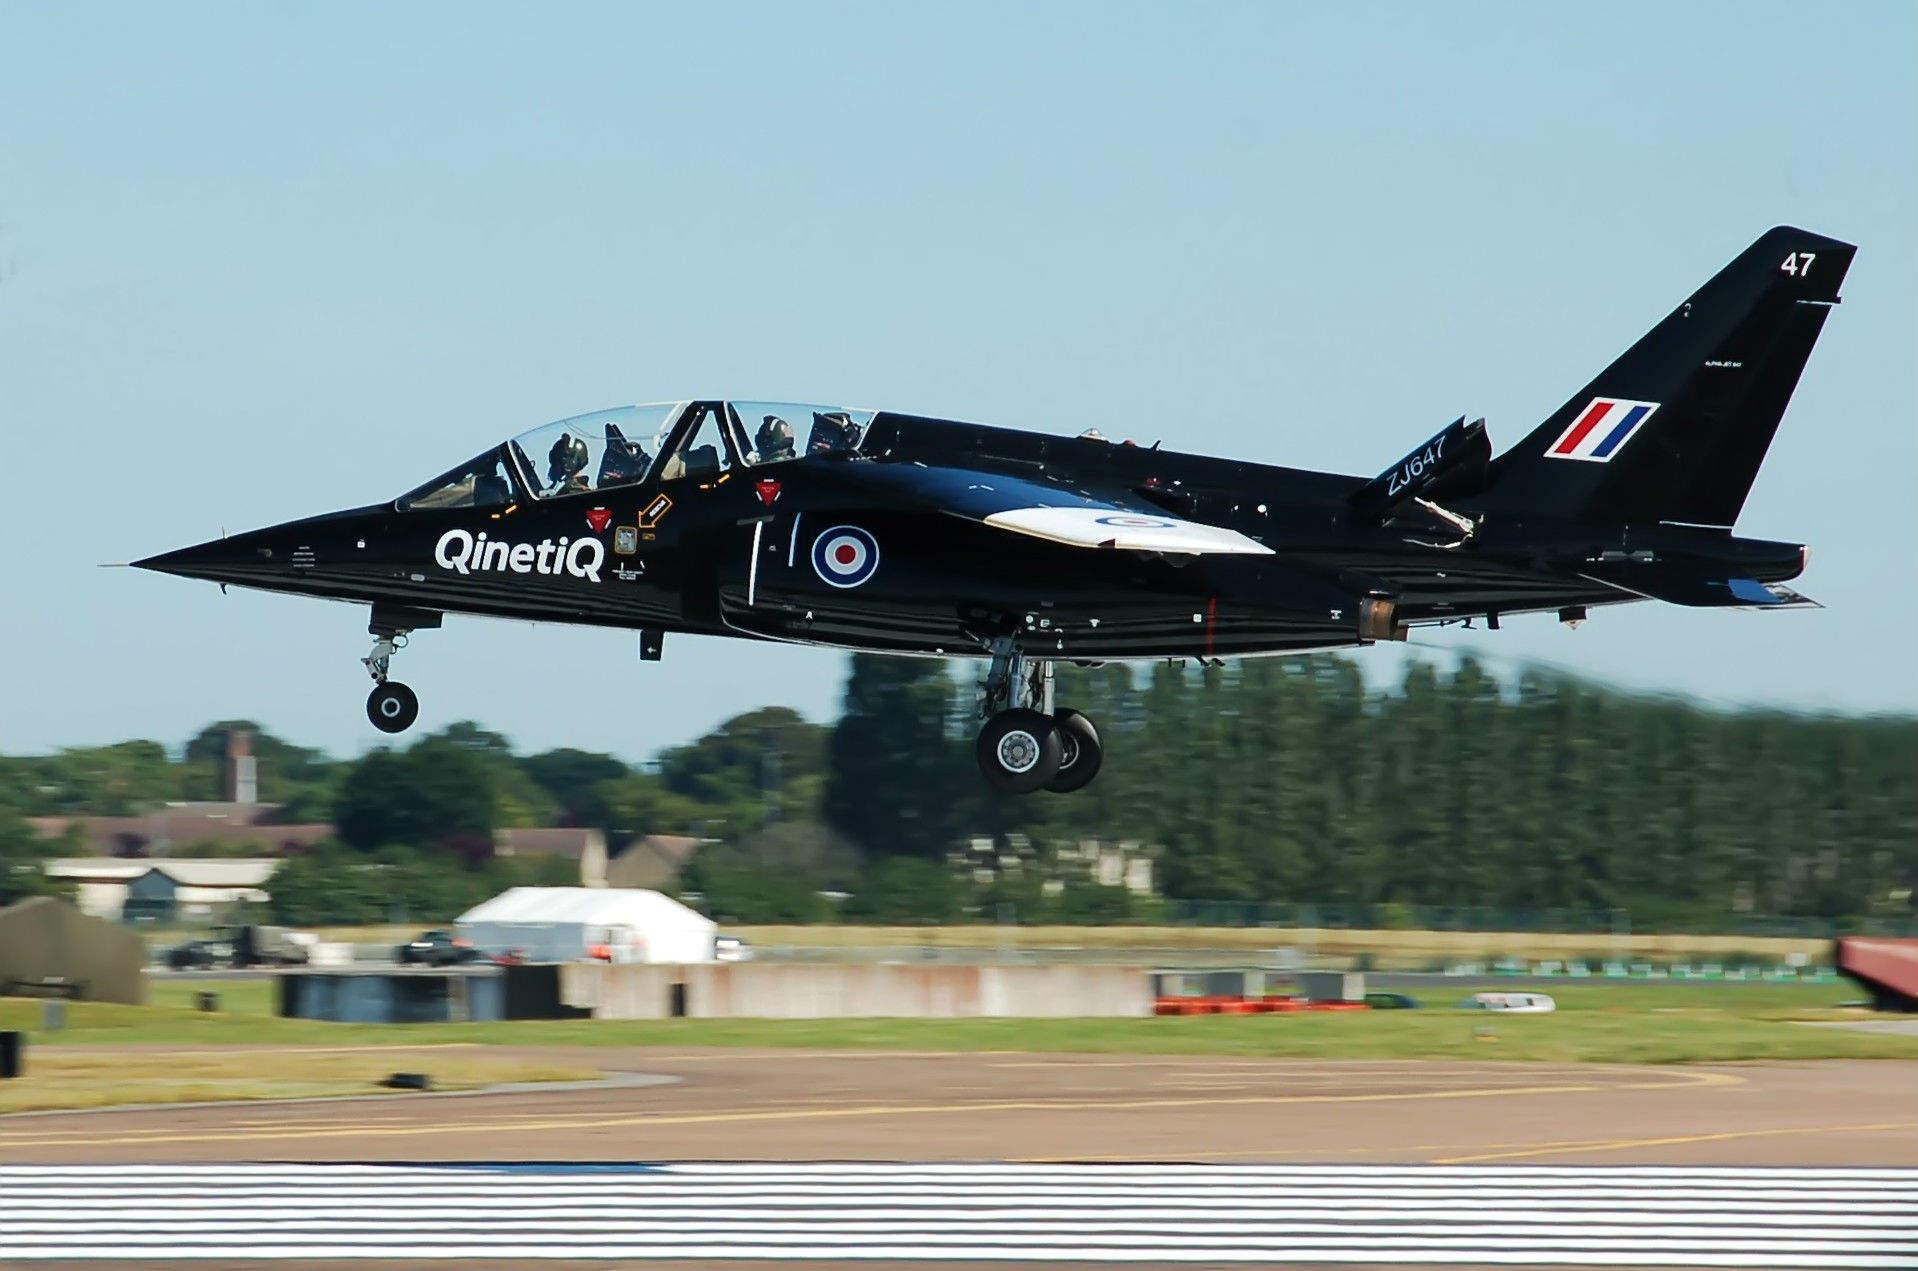 Qinetiq aircraft flying plane